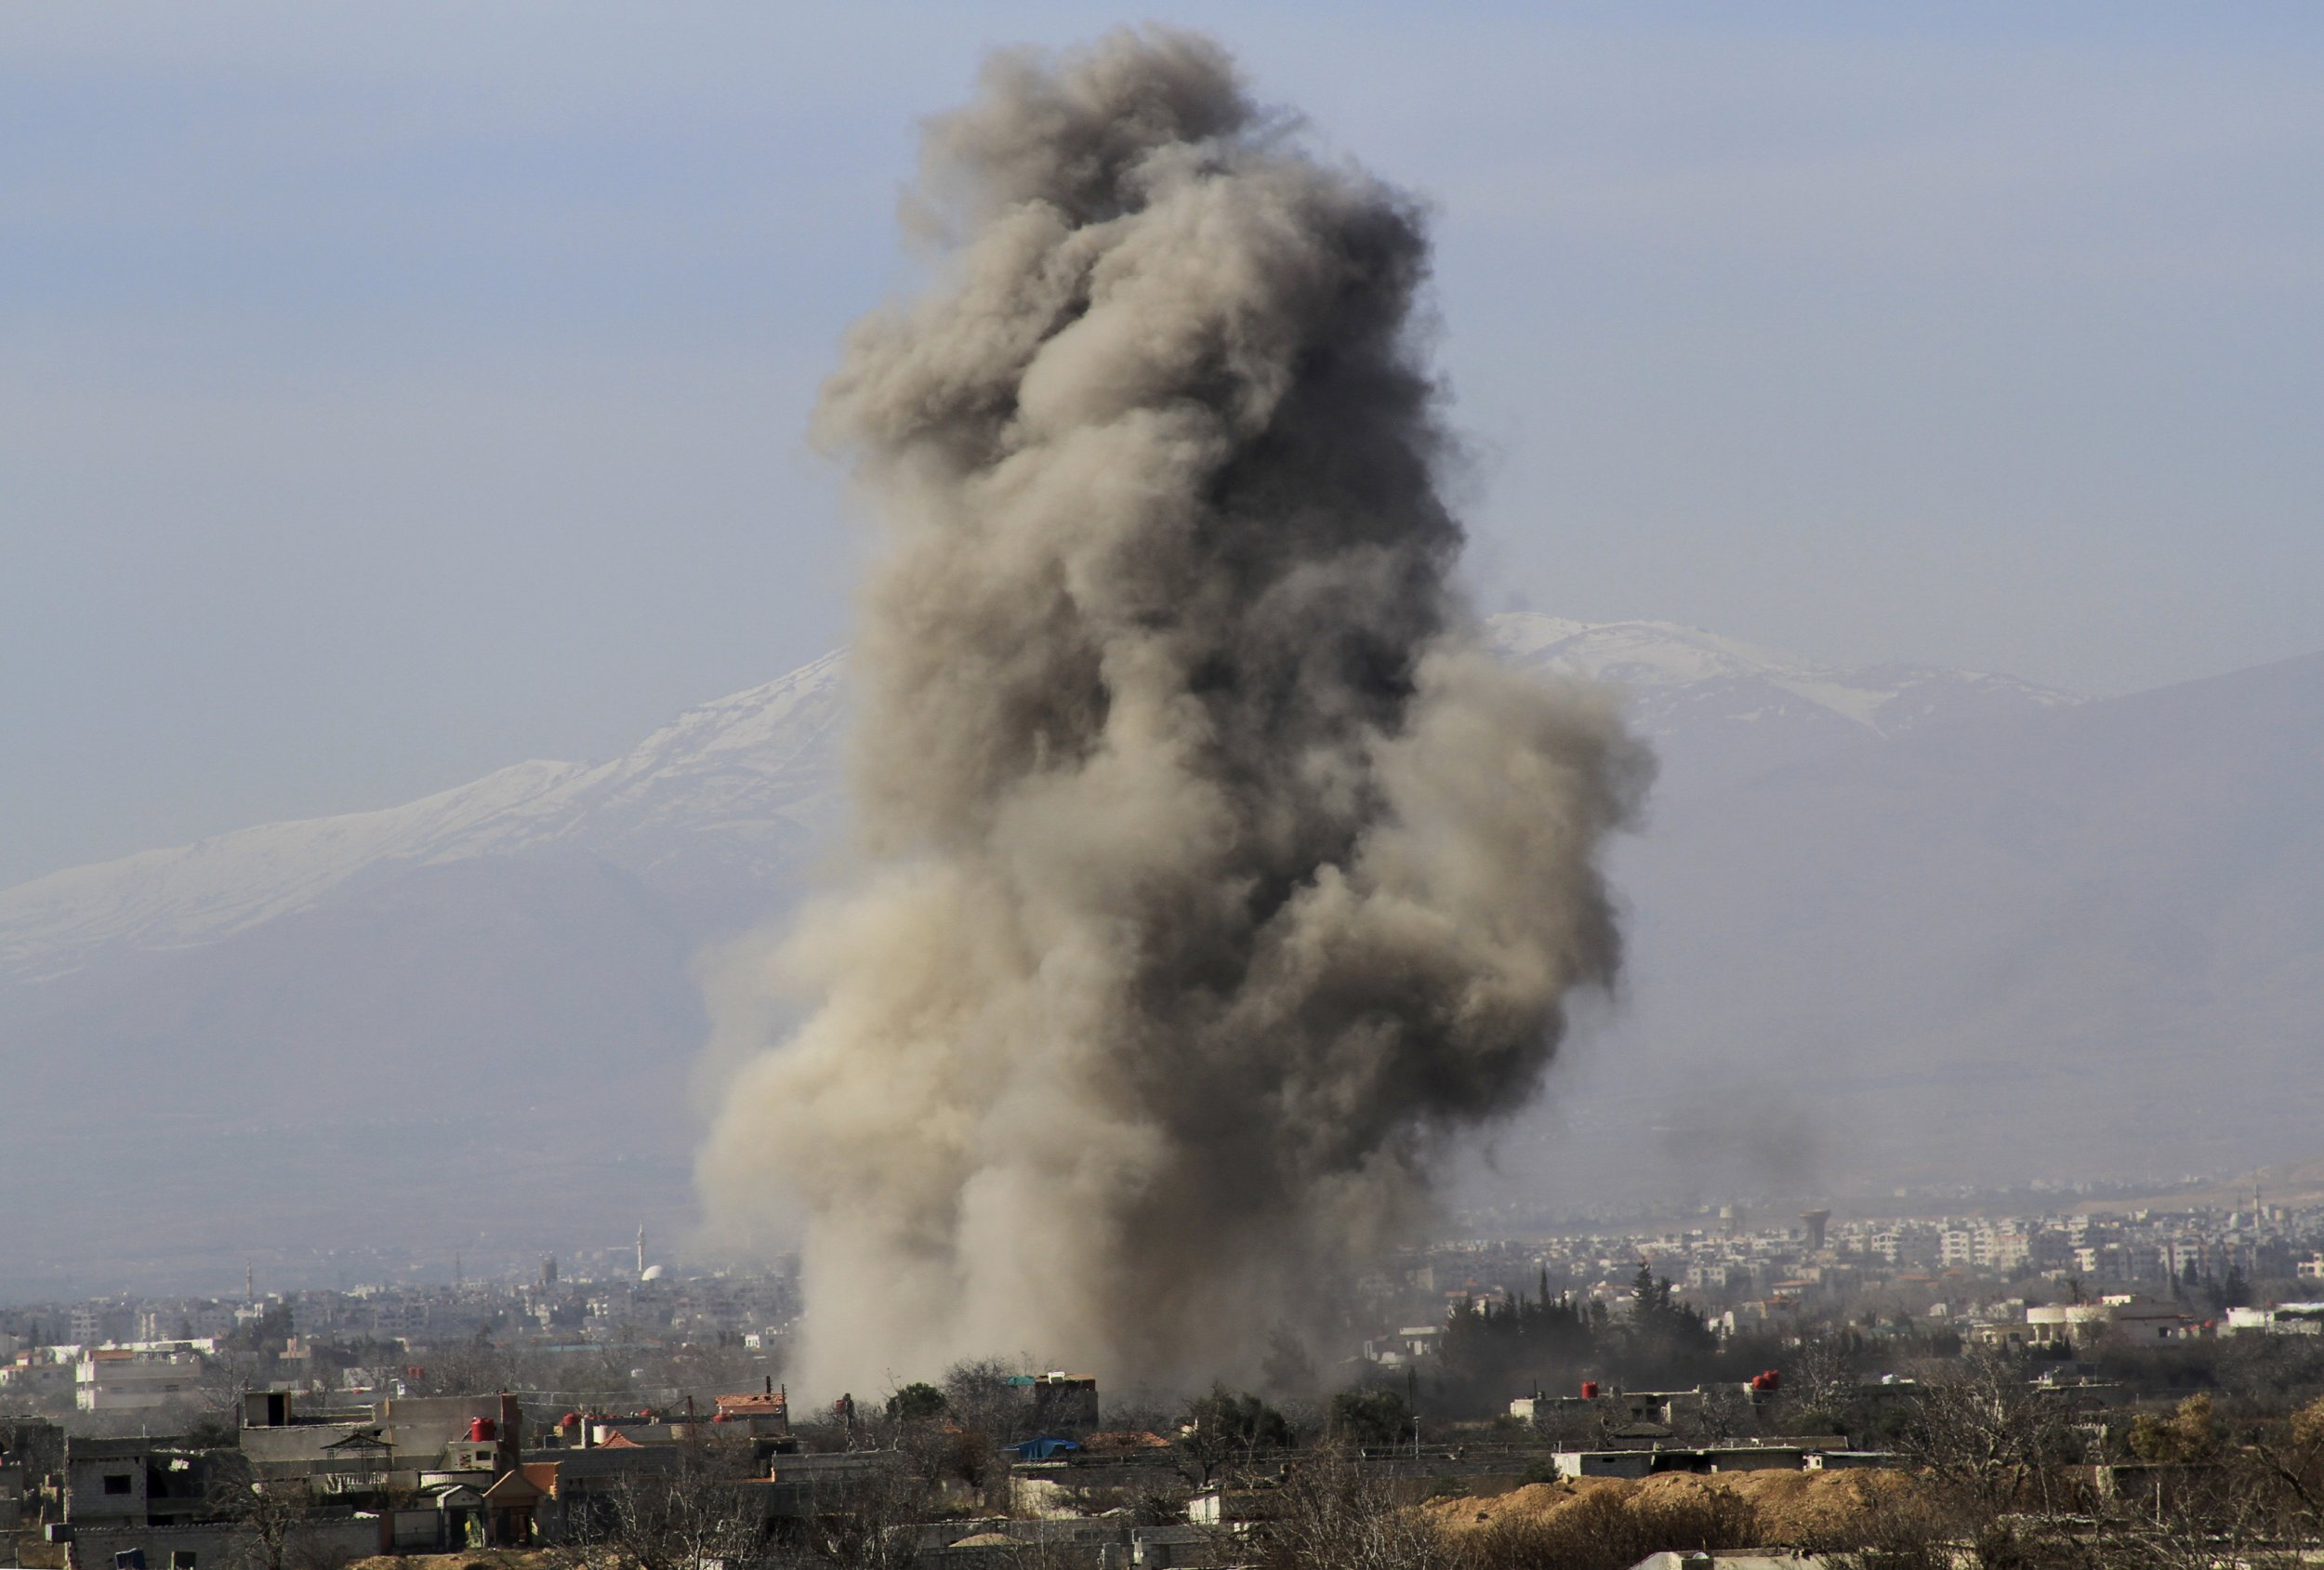 Smoke from barrel bombs